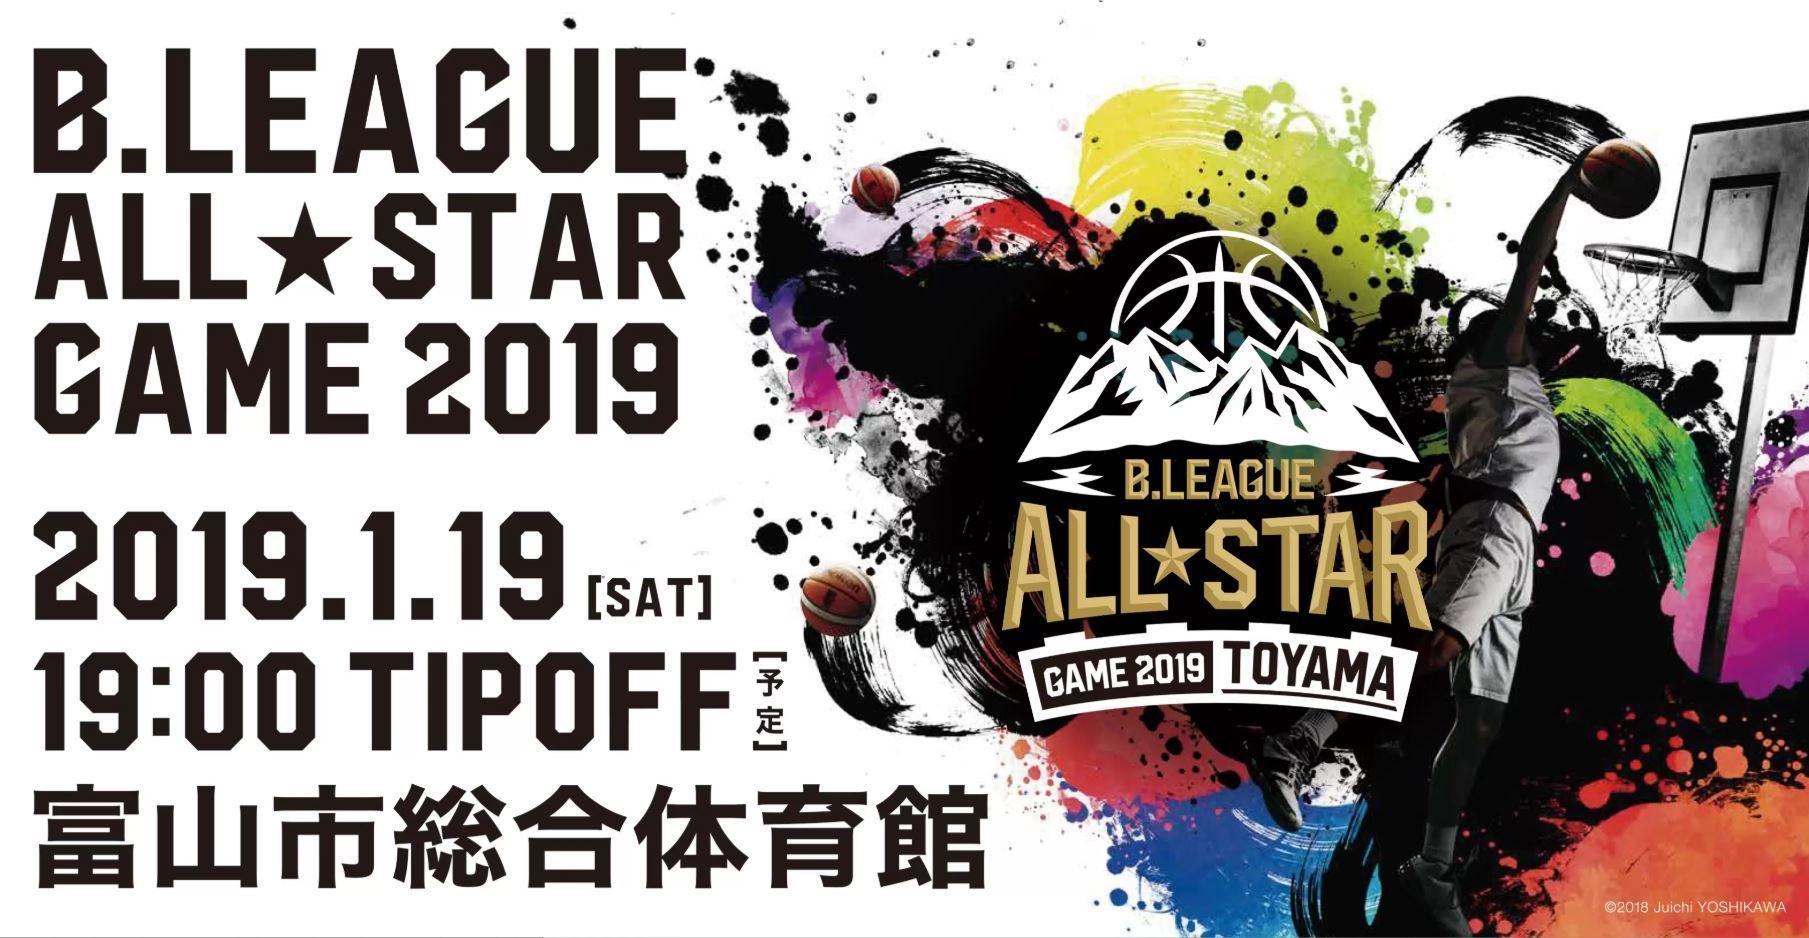 『B.LEAGUE ALL-STAR GAME 2019』は富山市総合体育館で開催される